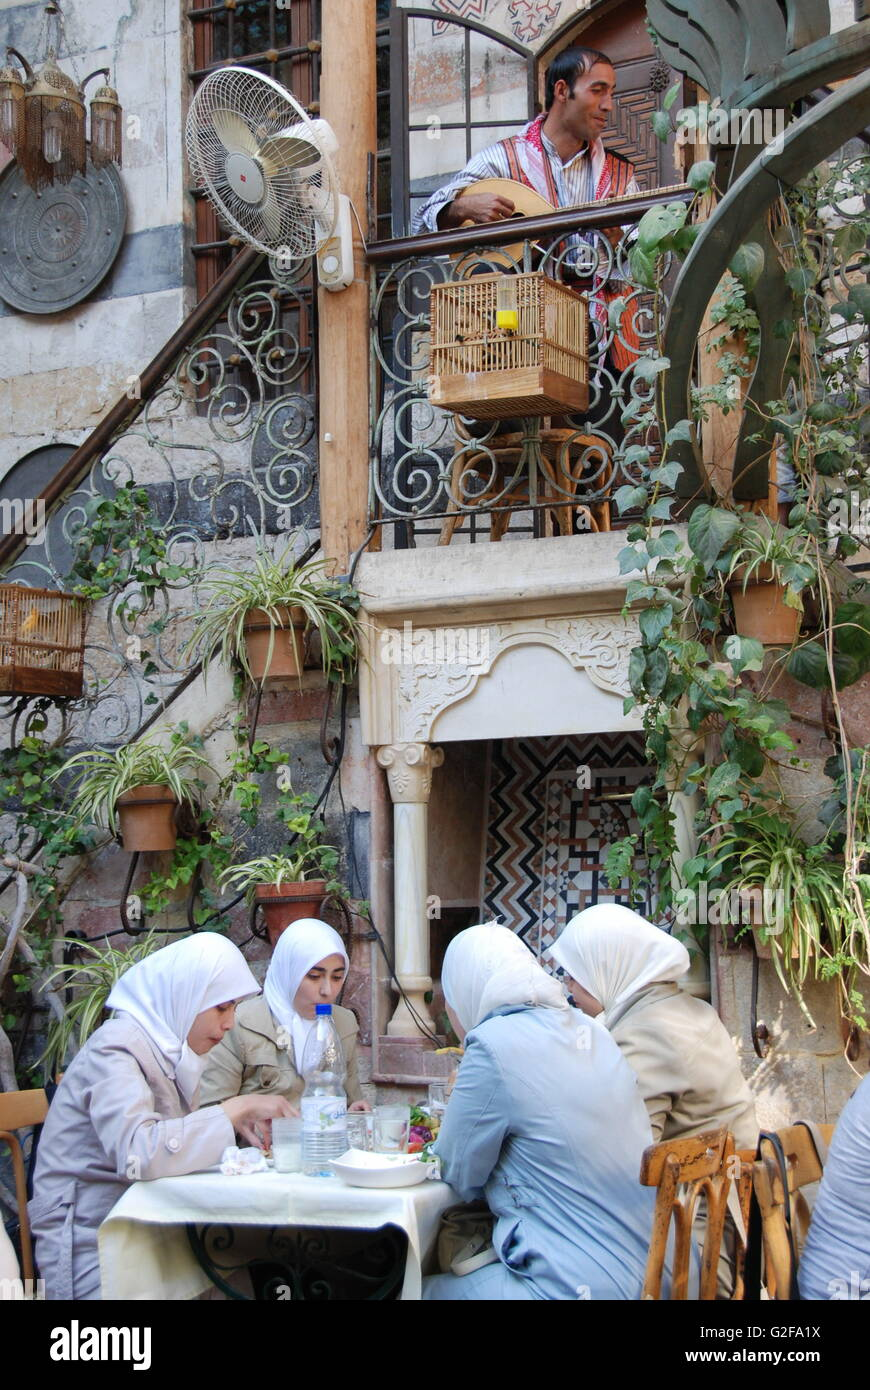 Damascus - Beit Jabri Restaurant, Four Ladies In Hijab Having Lunch - Stock Image